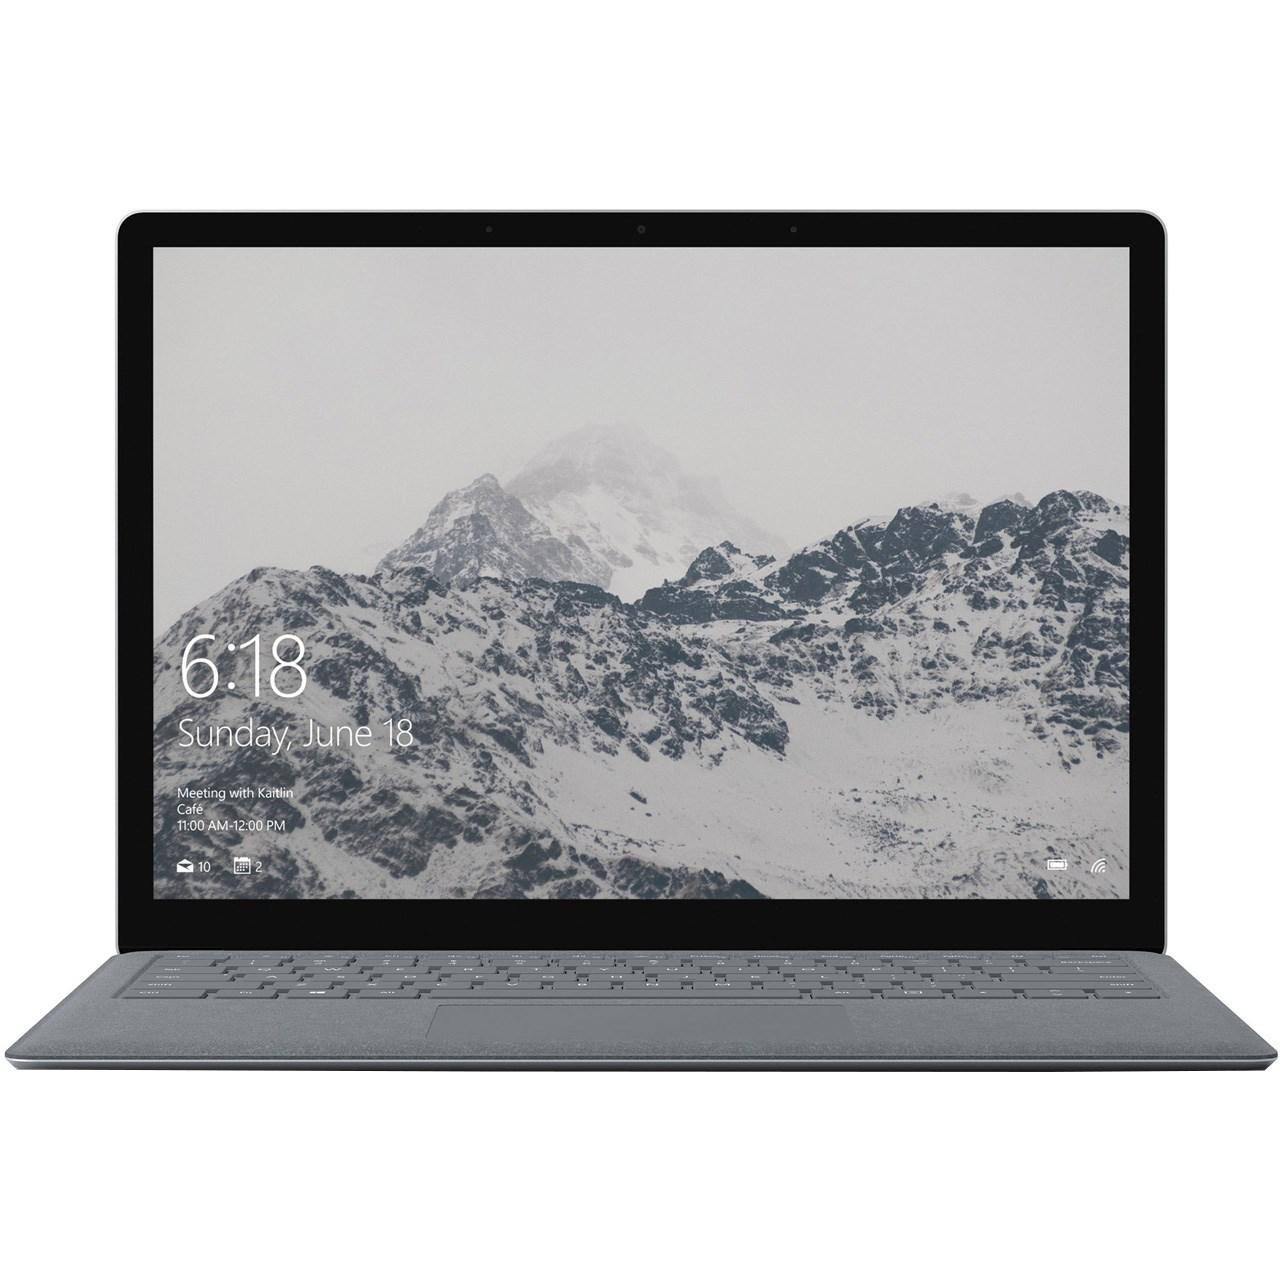 تصویر لپ تاپ 13 اینچی مایکروسافت مدل Surface Laptop - A Microsoft Surface Laptop - A - 13 inch Laptop